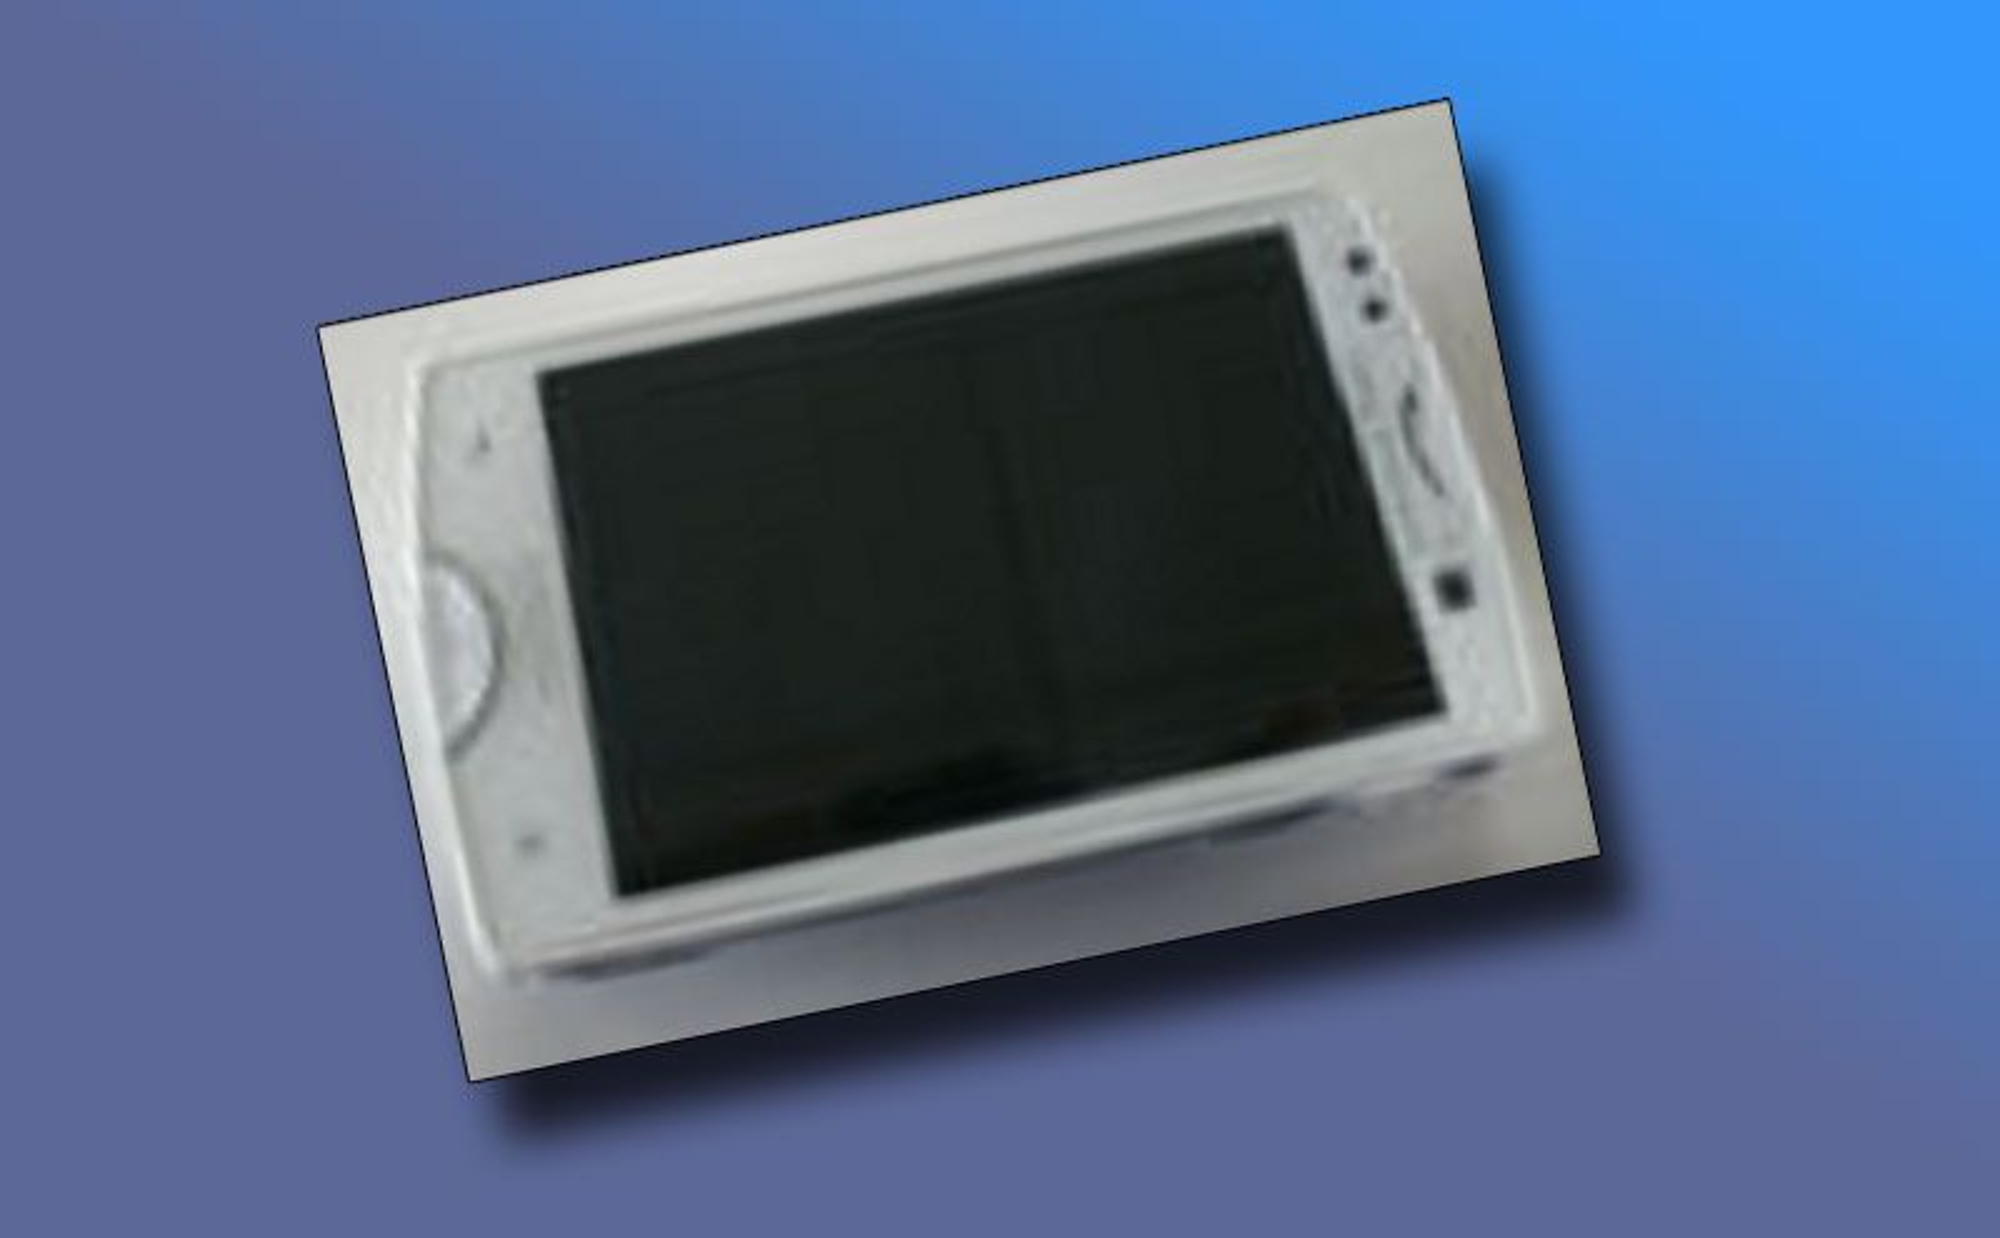 Dette kan være Sony Ericssons nye Mini